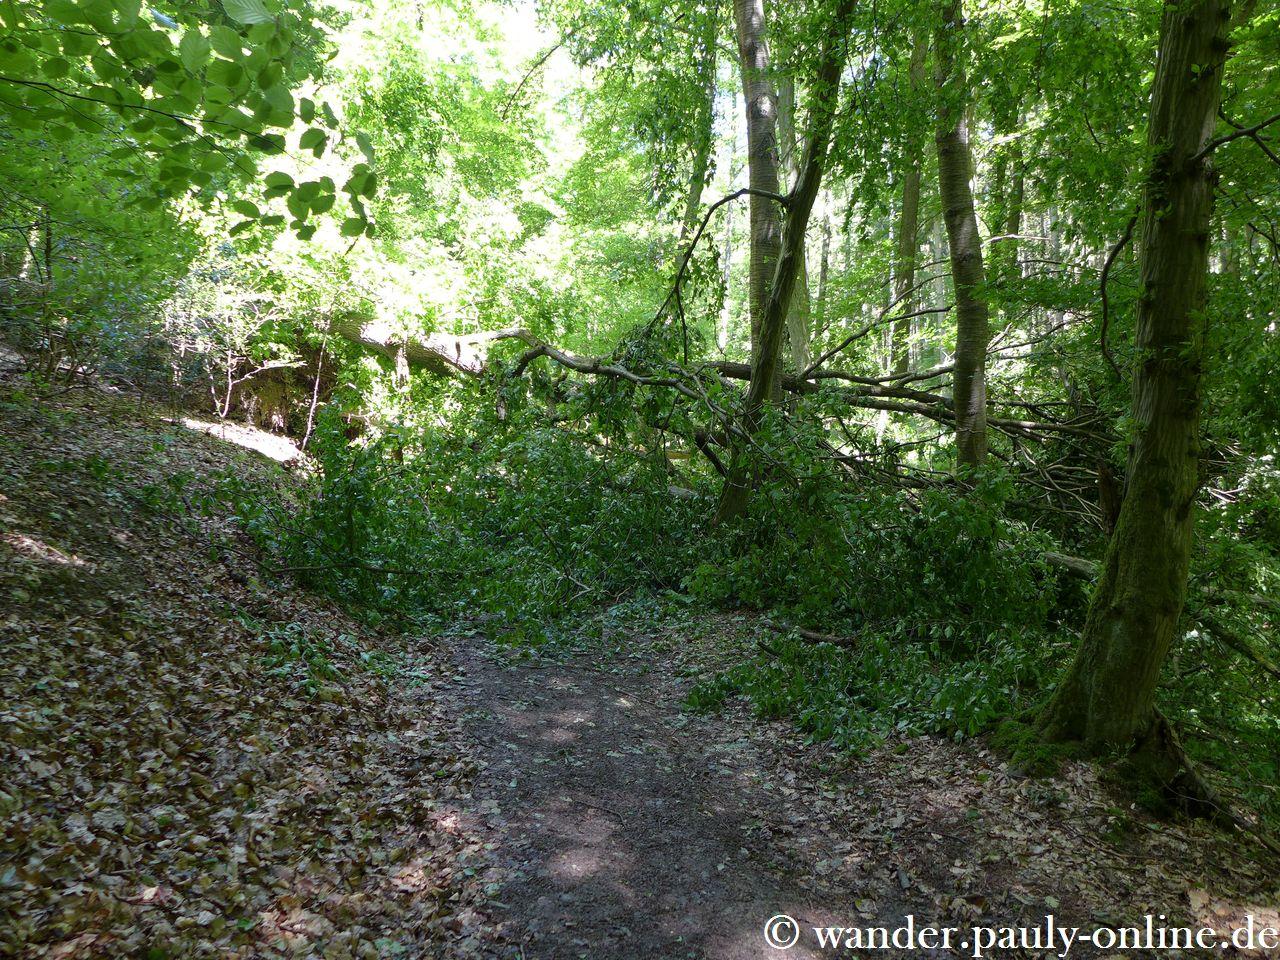 Ein umgestürzter Baum versperrt den Weg